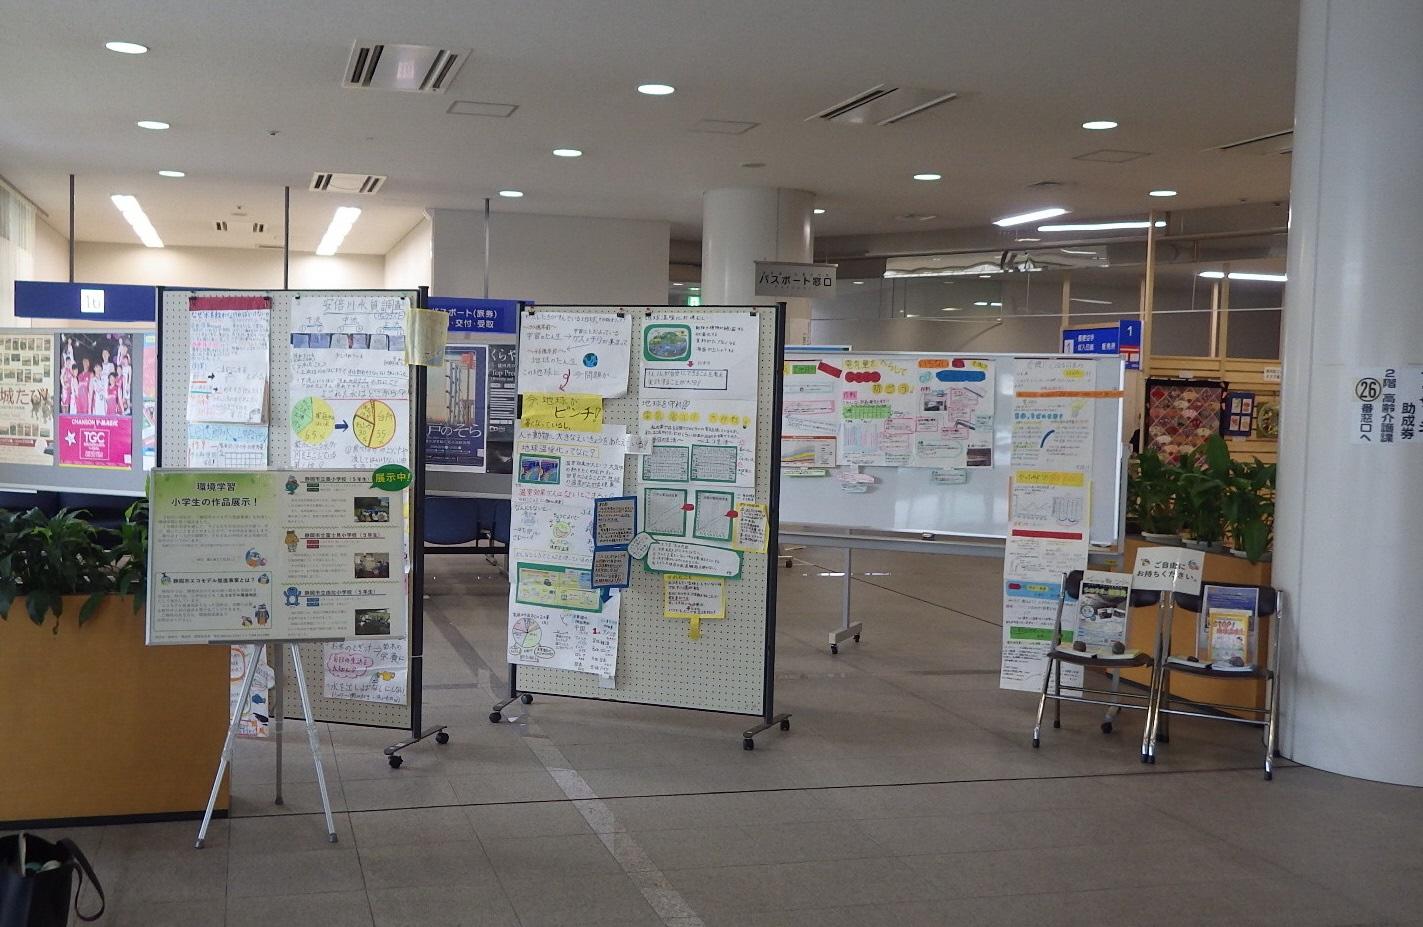 http://www.shizutan.jp/learning/2019/01/29/images/IMGP0031.jpg